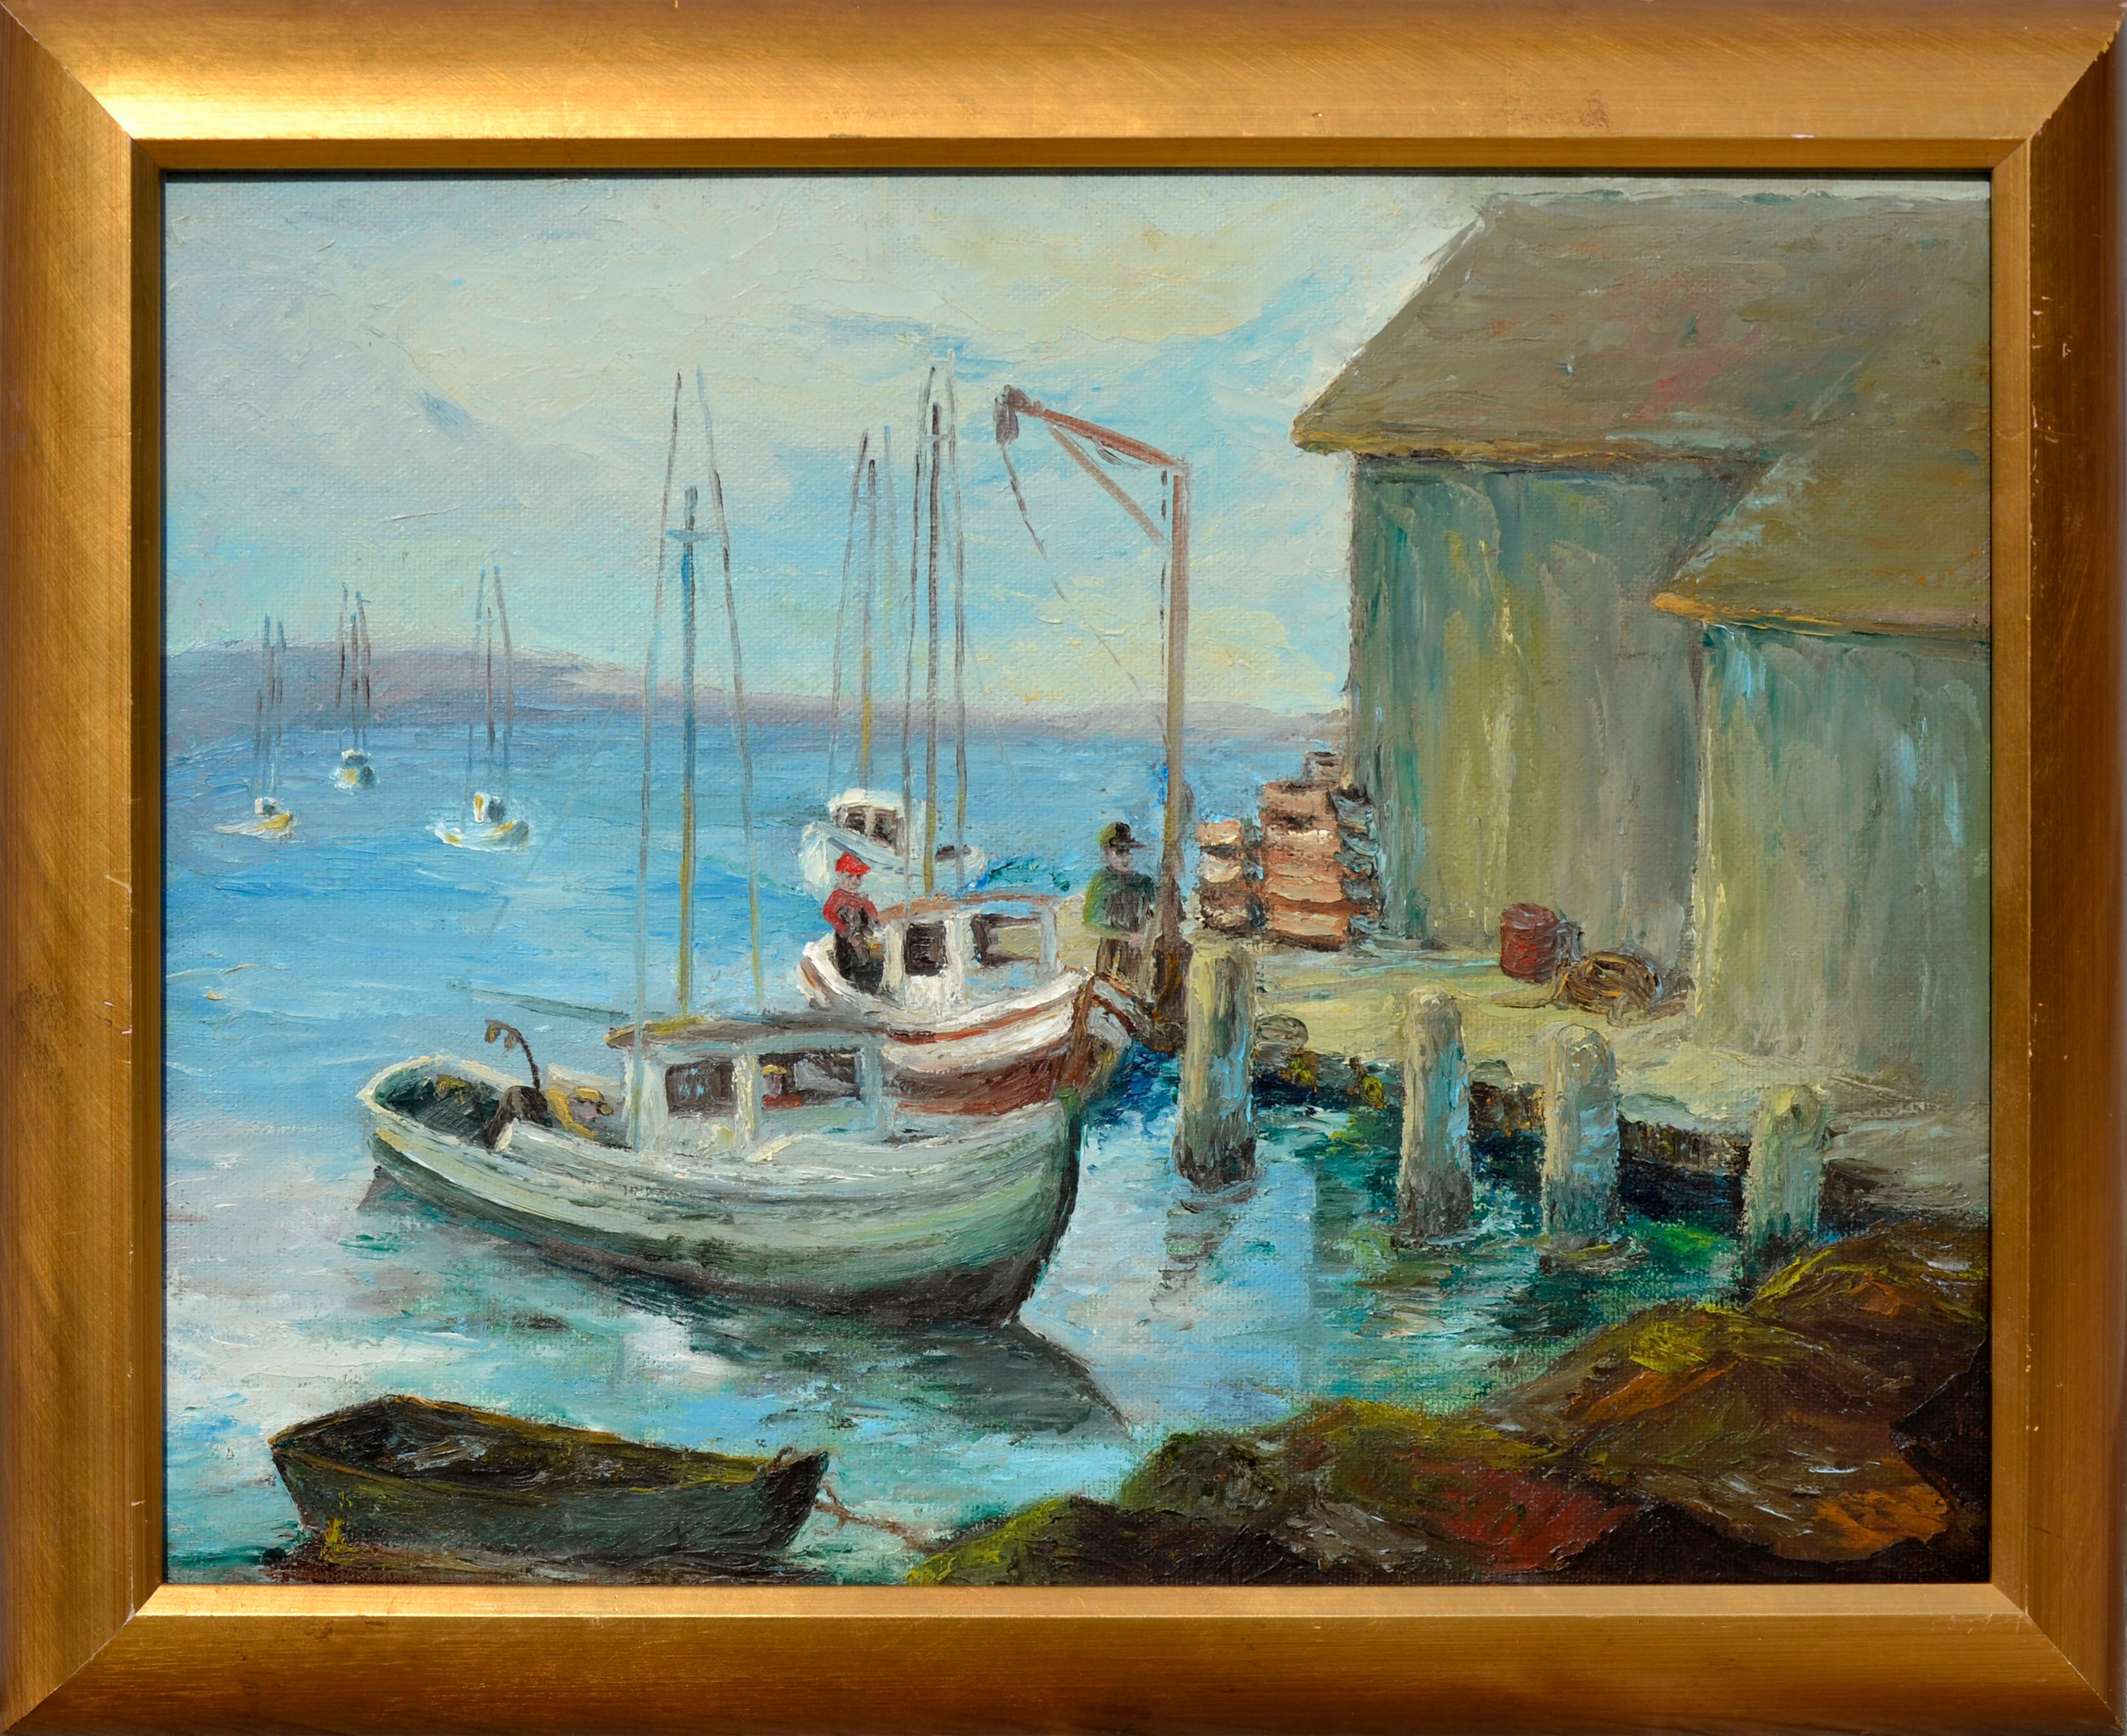 Fishermen at the Dock, Monterey - Mid Century Figurative Landscape